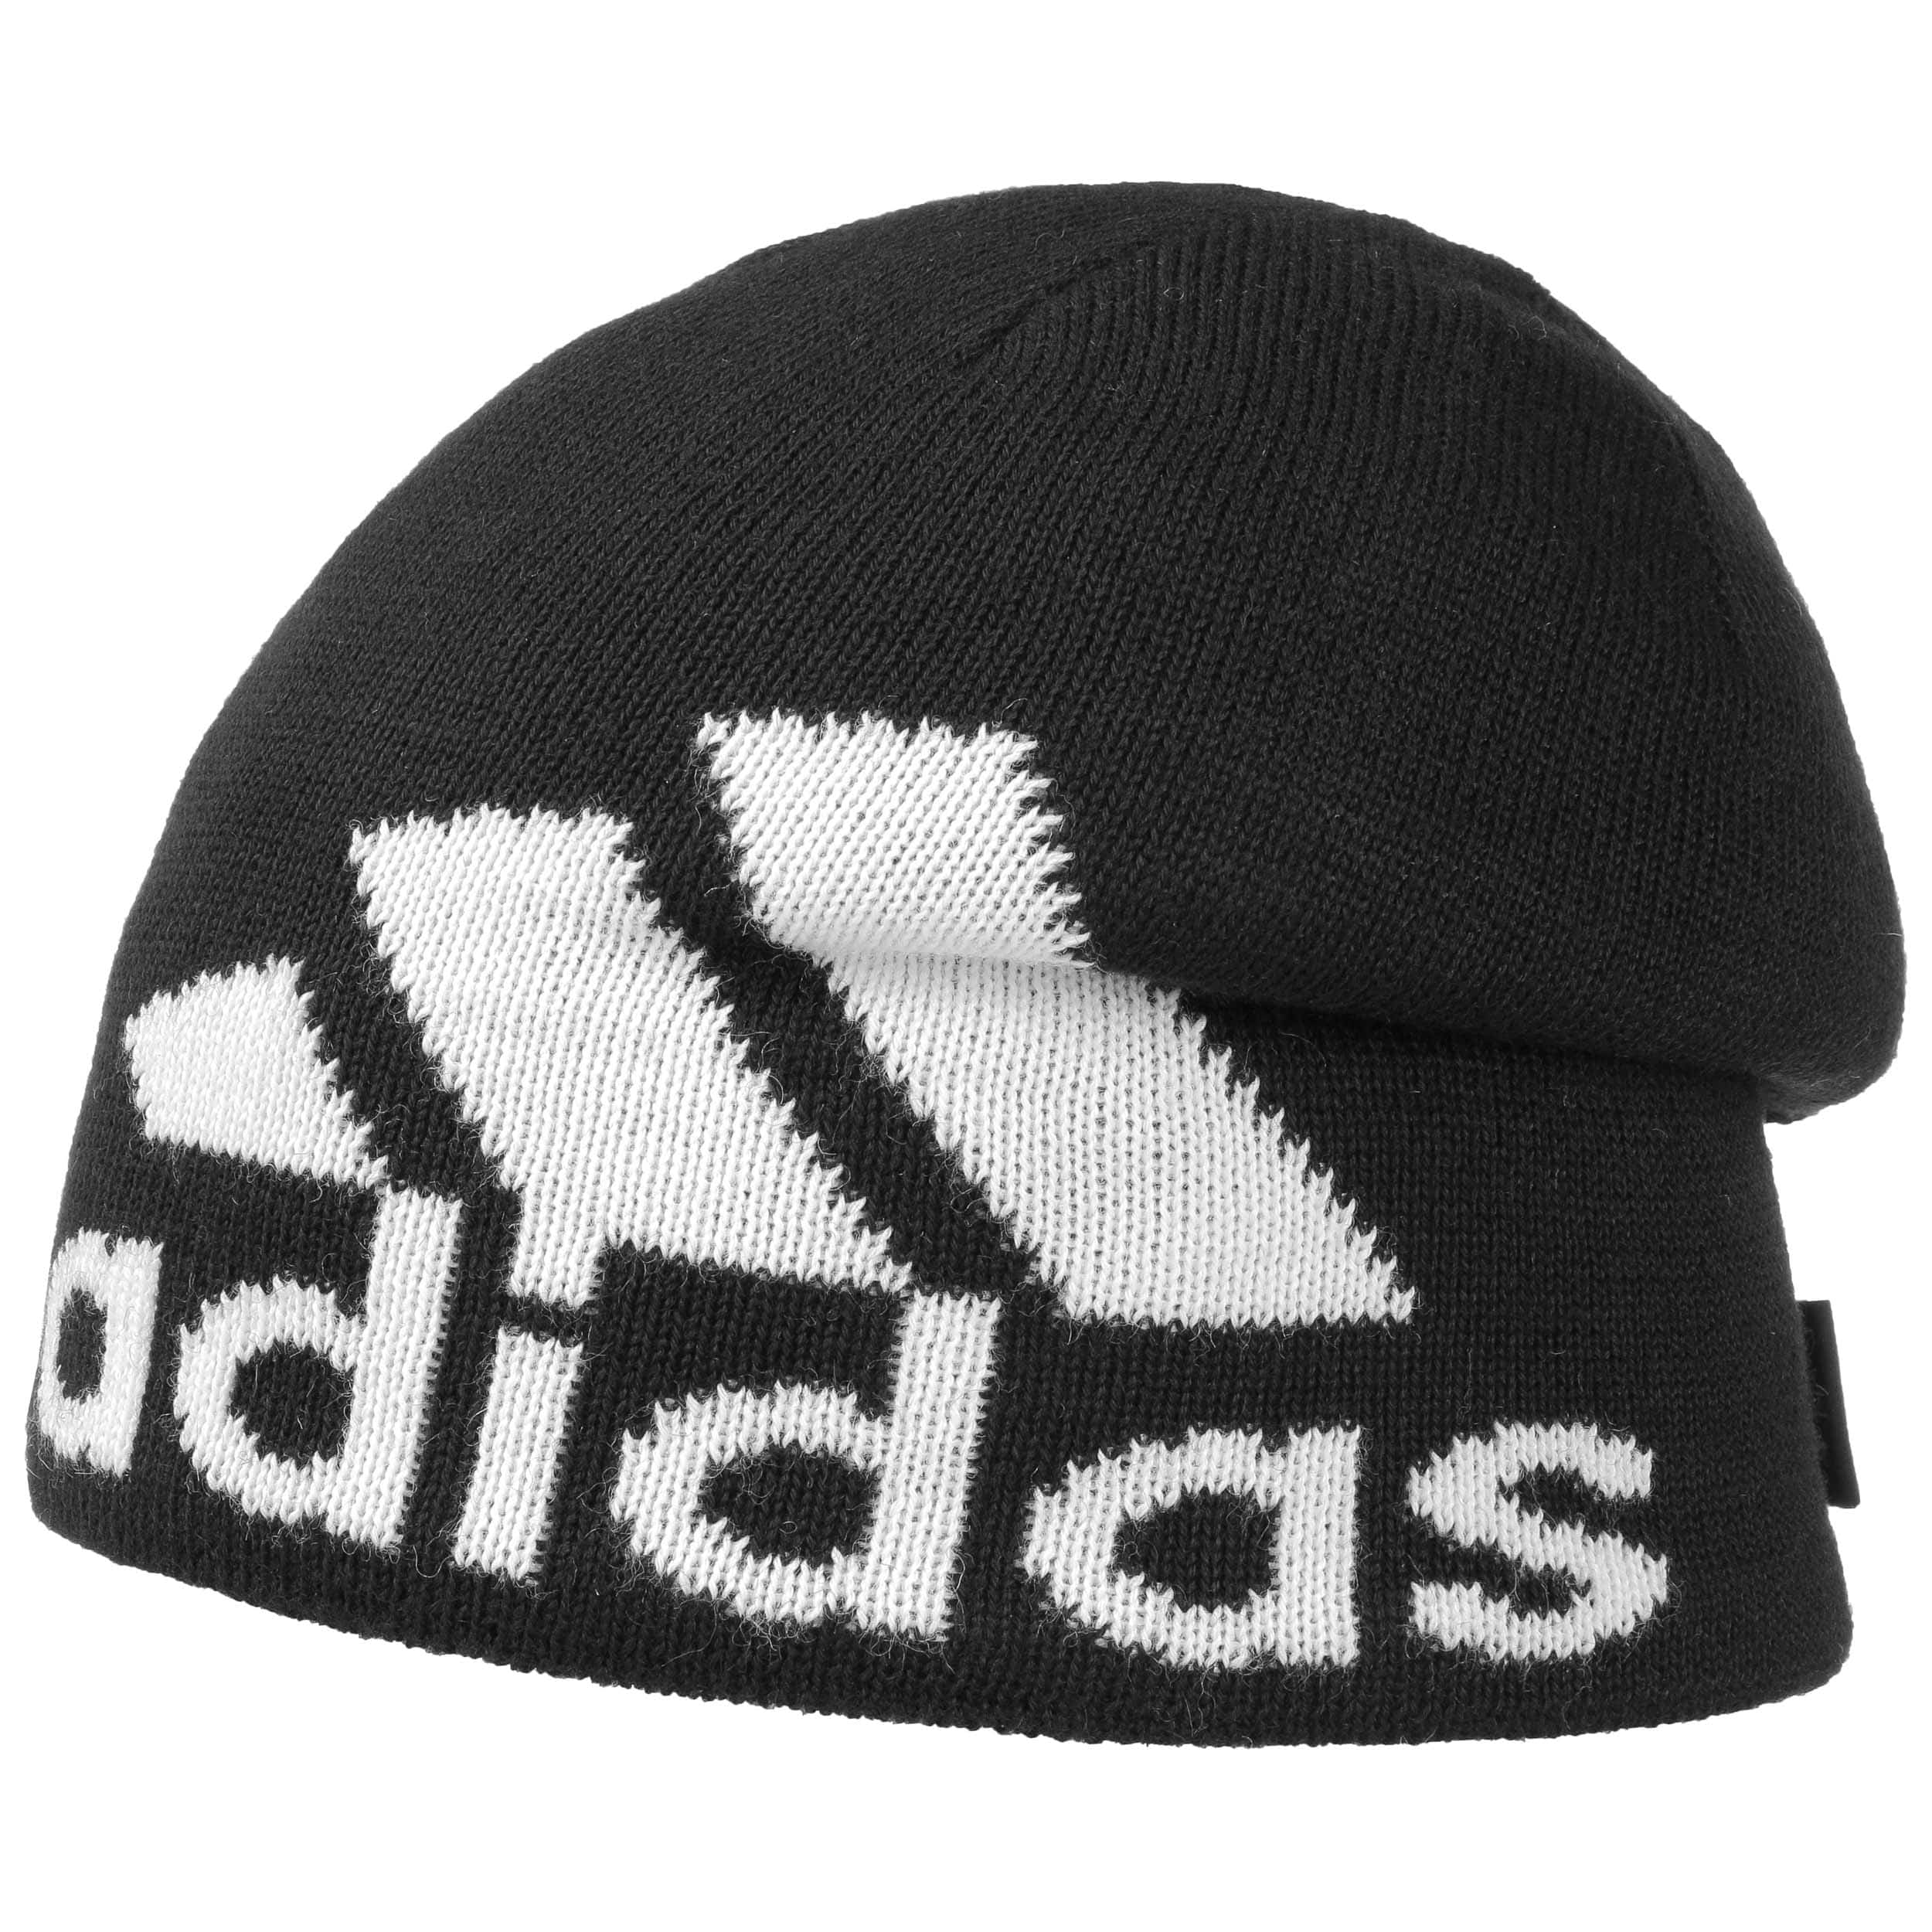 0b2c4dbf3 ... Knit Logo Beanie by adidas - black-white 3 ...